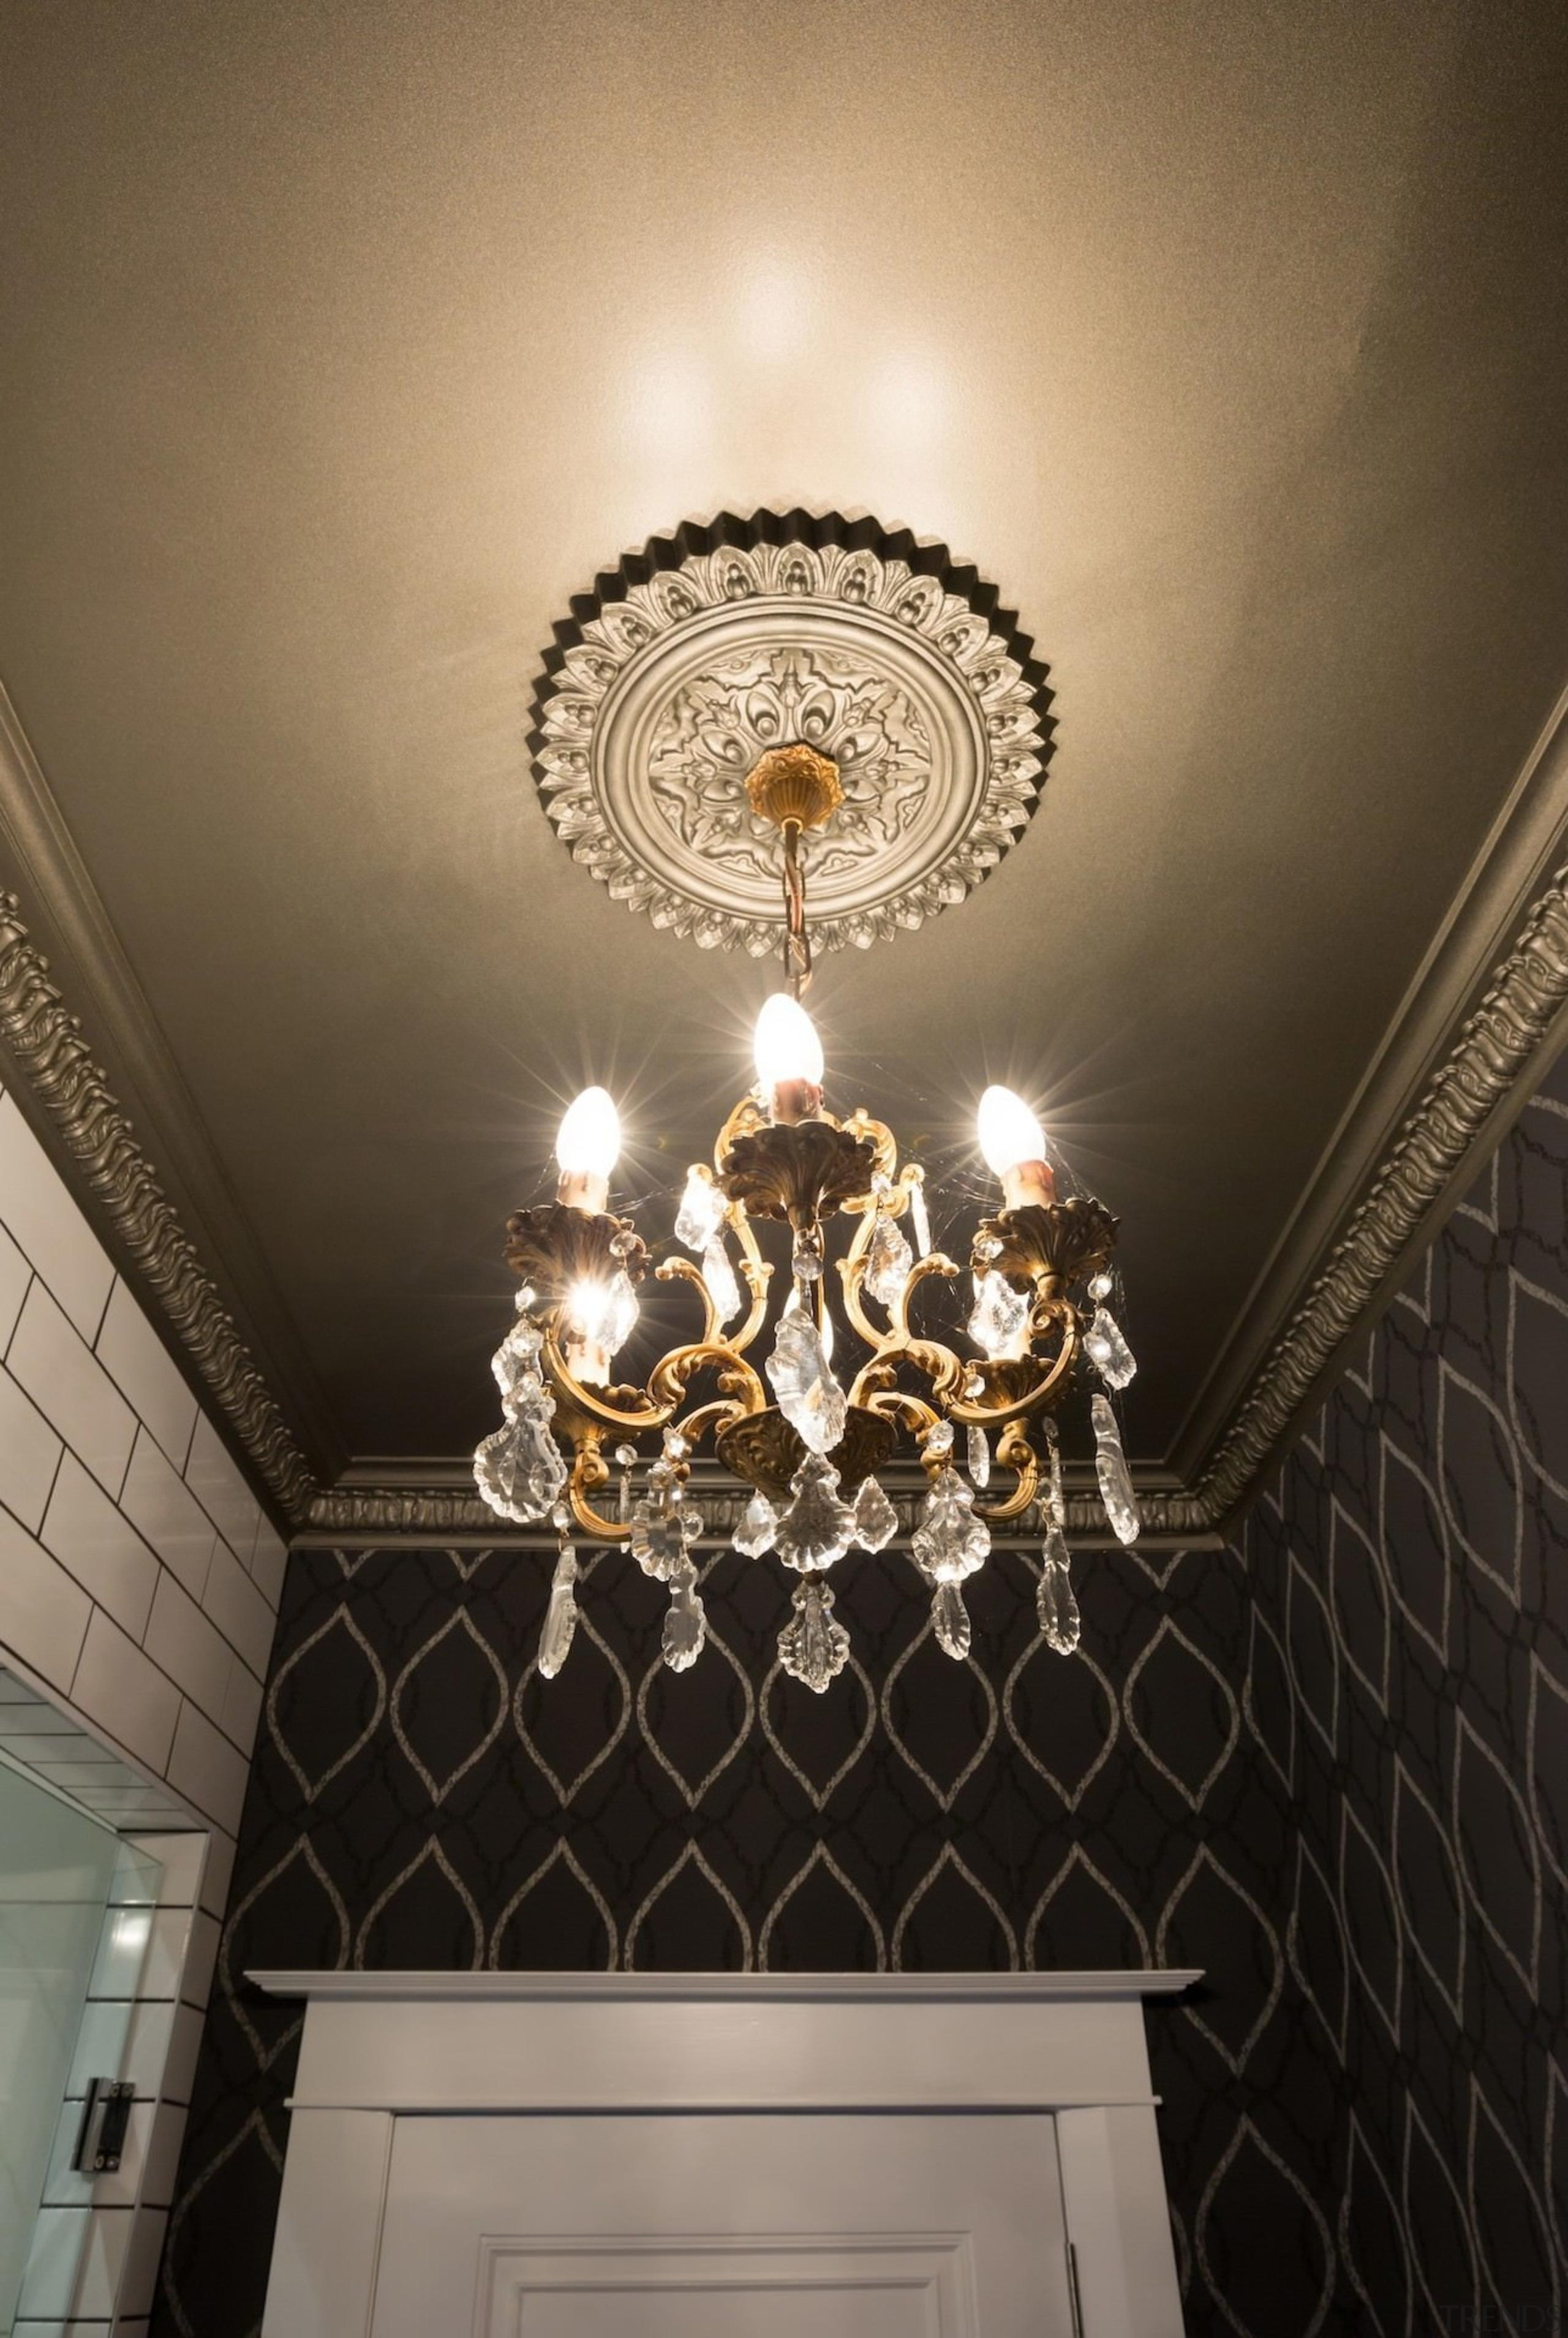 Chandelier and patterned wallpaper in powder room designed ceiling, chandelier, decor, light, light fixture, lighting, wall, black, brown